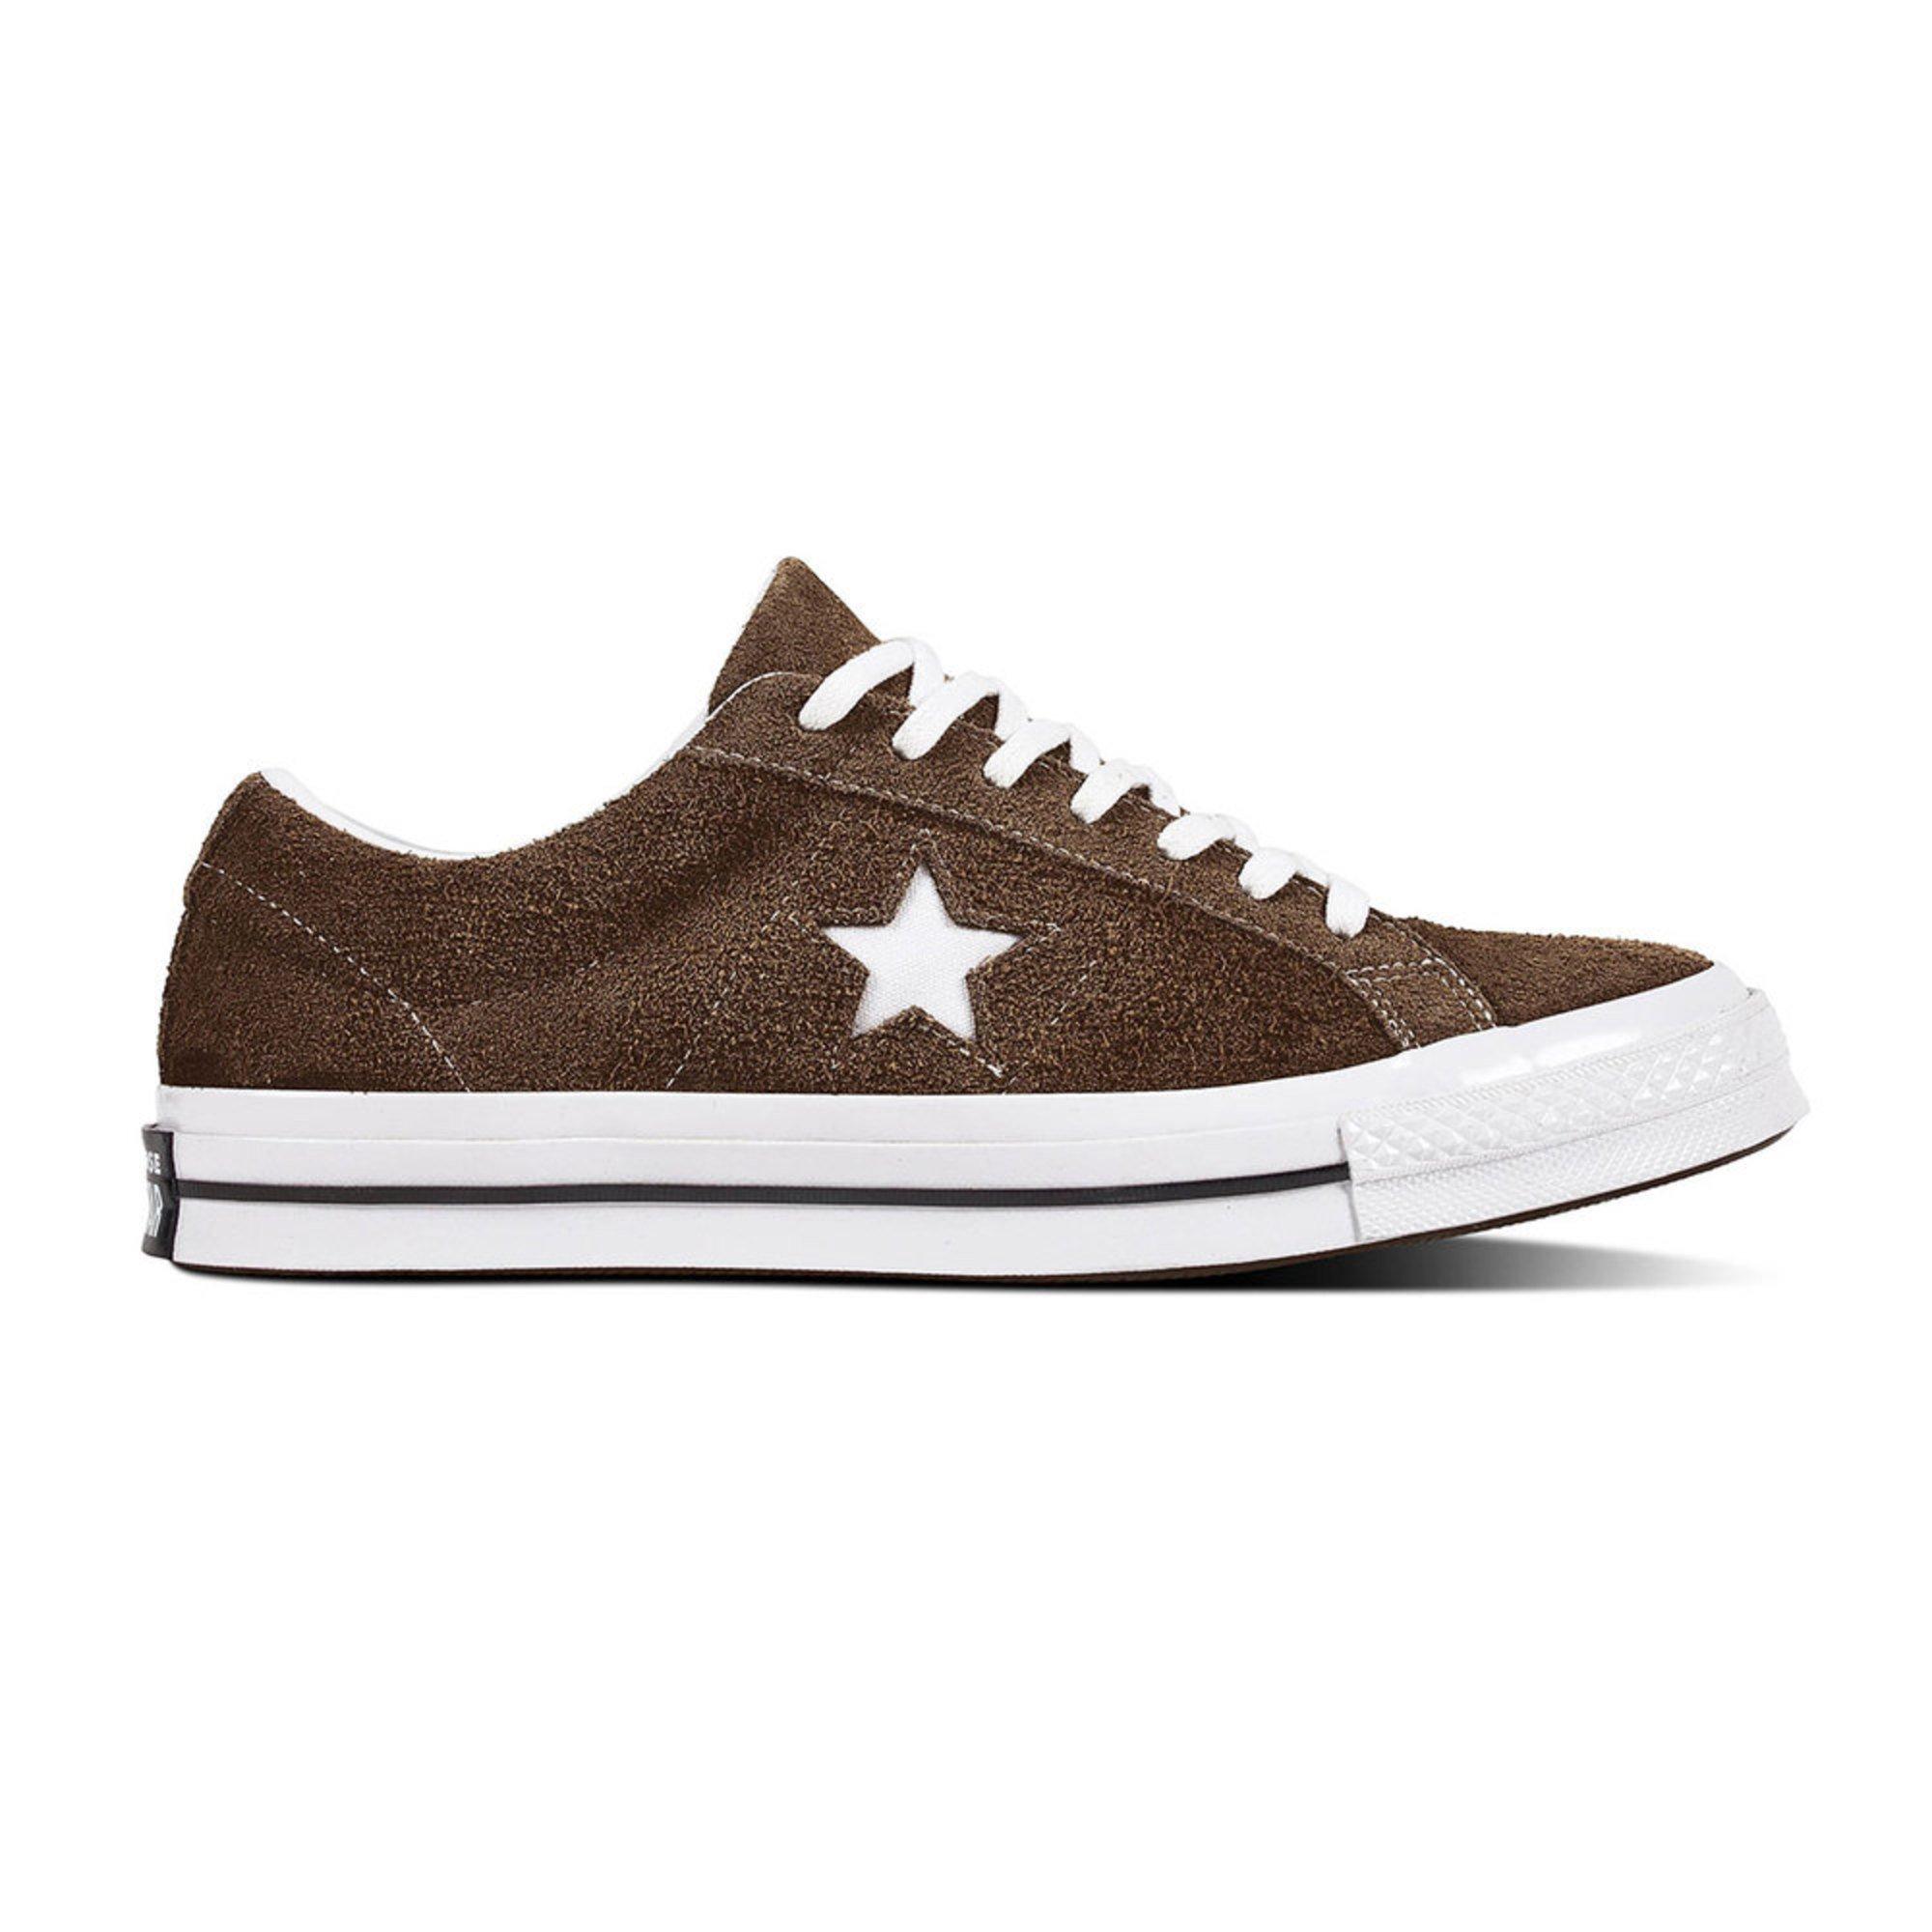 0714365a41a68e Converse. Converse Men s One Star Lifestyle Shoe